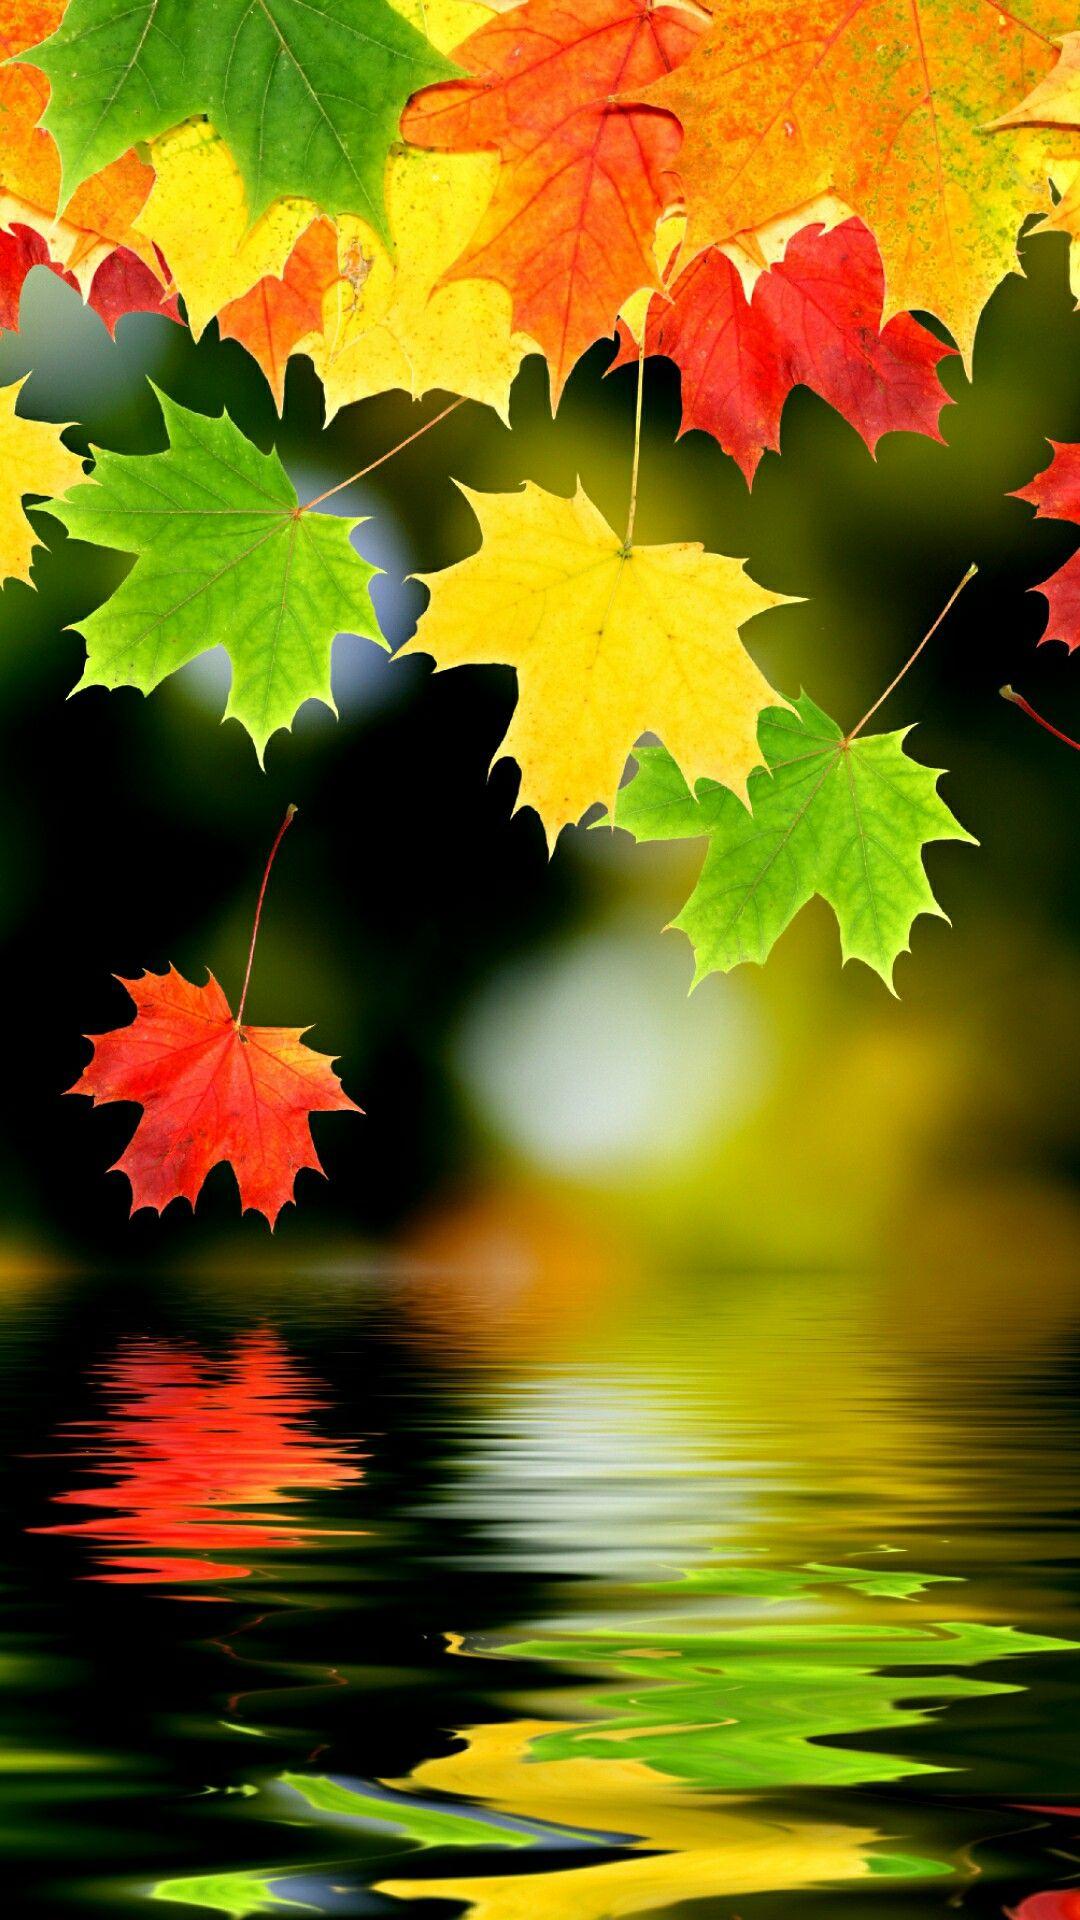 Pin by Jazmine Oleander on Art Autumn leaves wallpaper